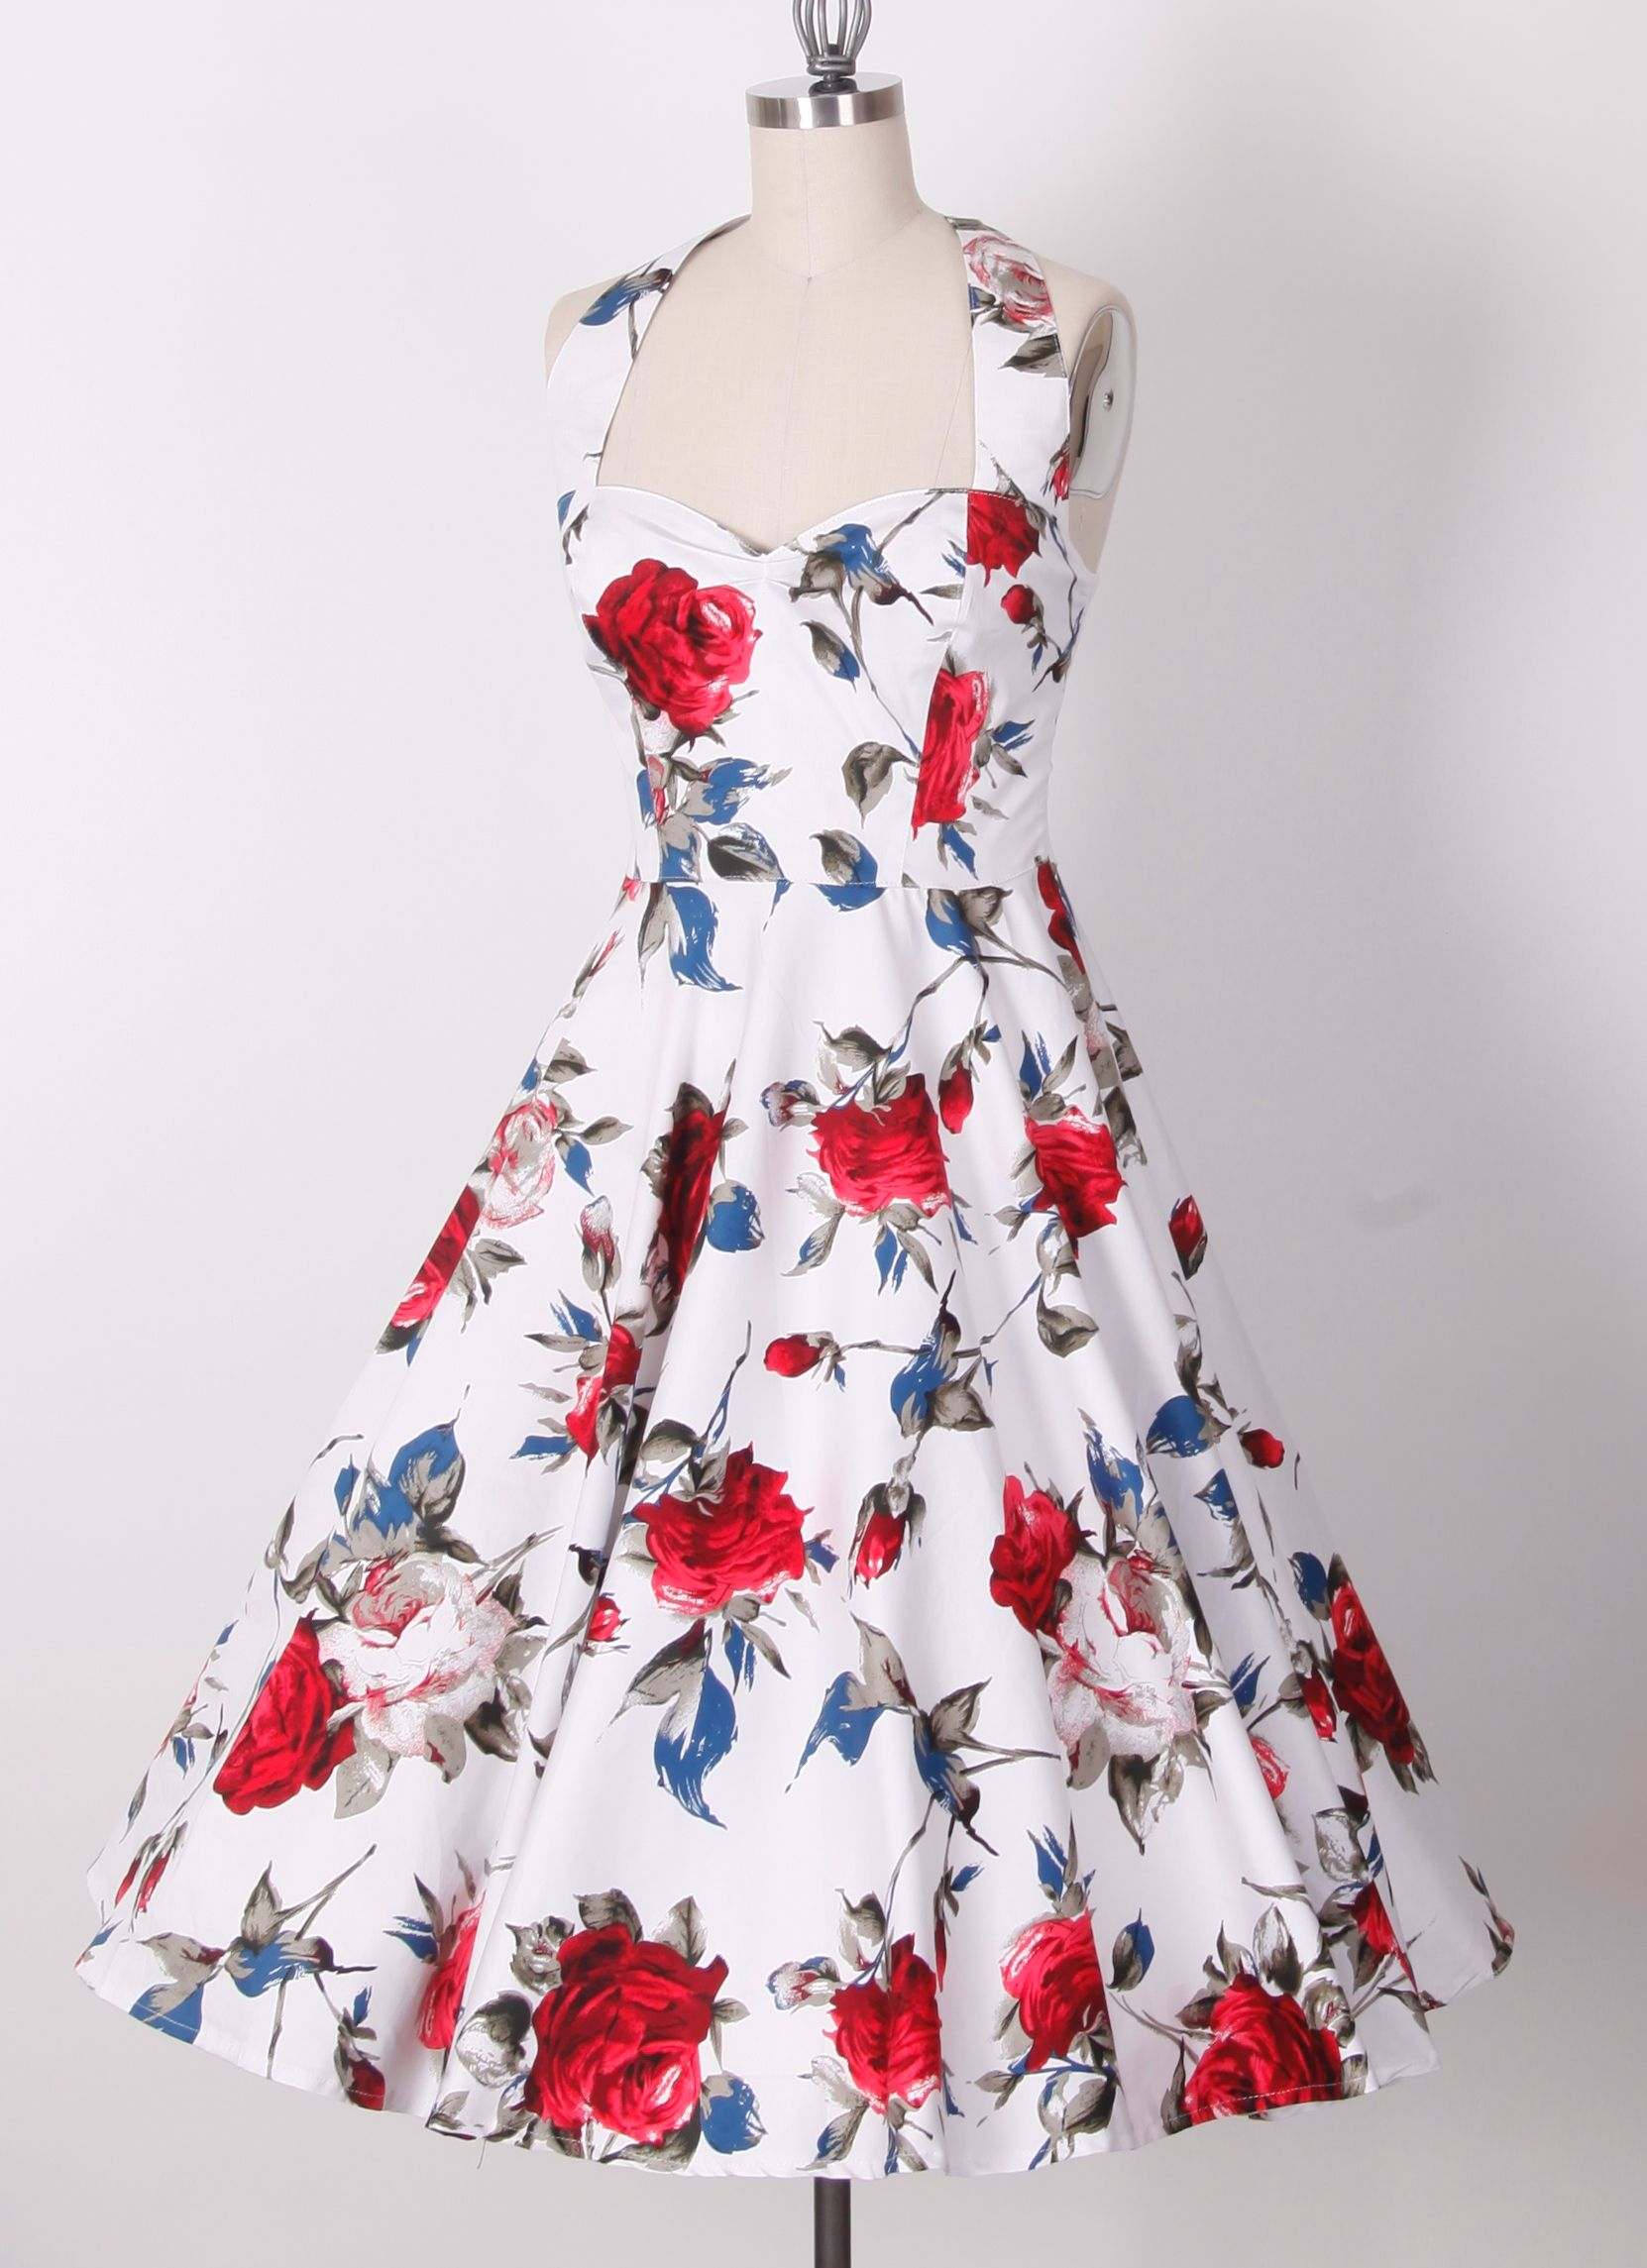 50s Halterneck Swing Pinup Retro Dress 20127242 20127242